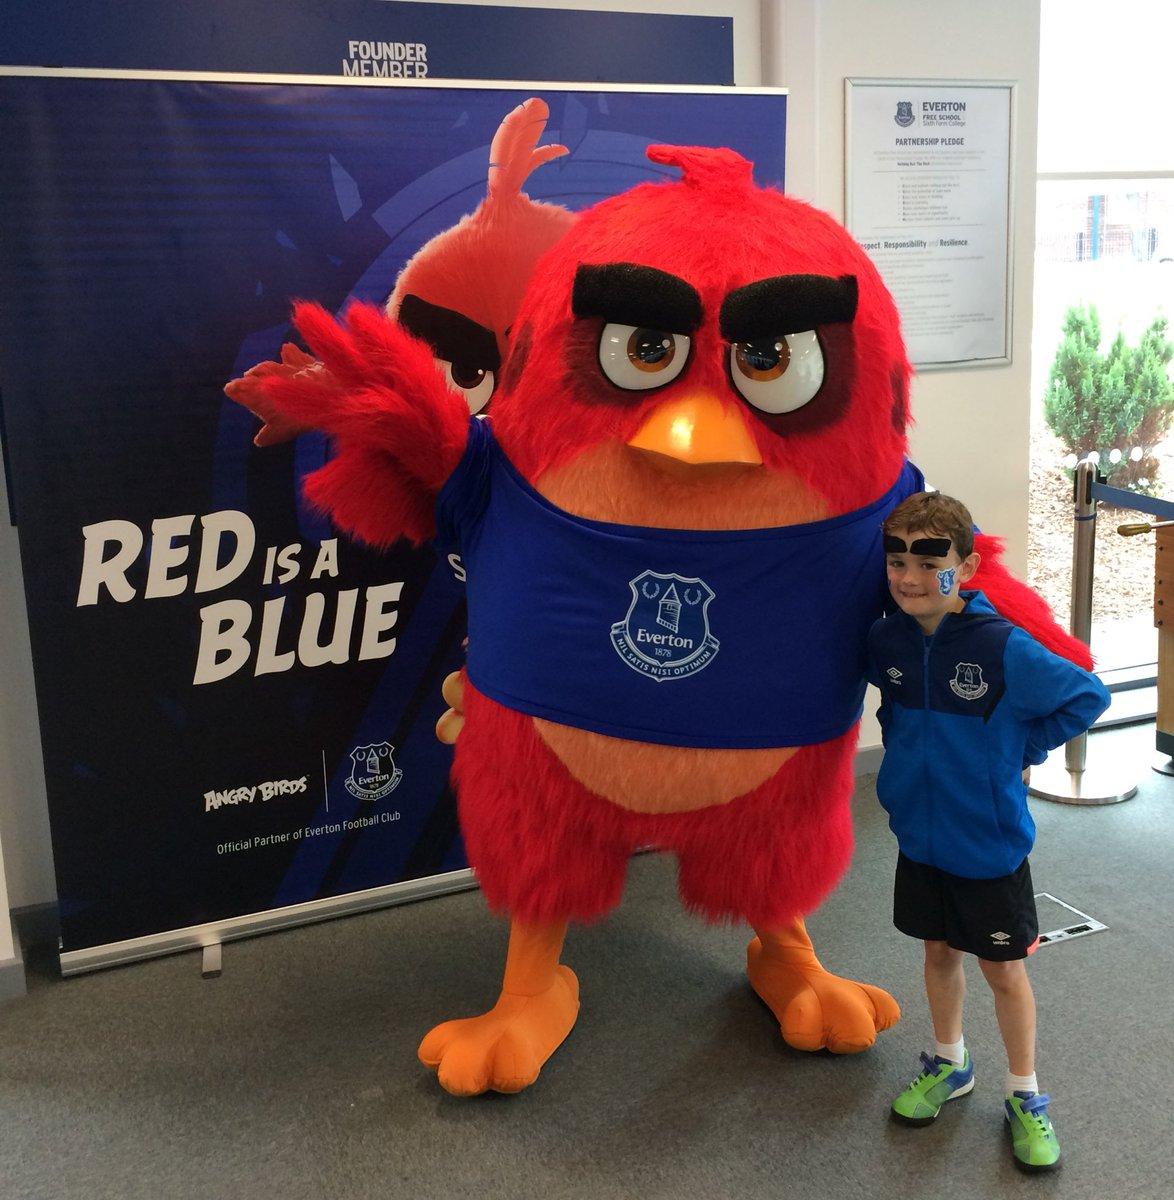 Eoin B@ceathrumor         @AngryBirds @Everton #RedIsABlue #EFCmatchday